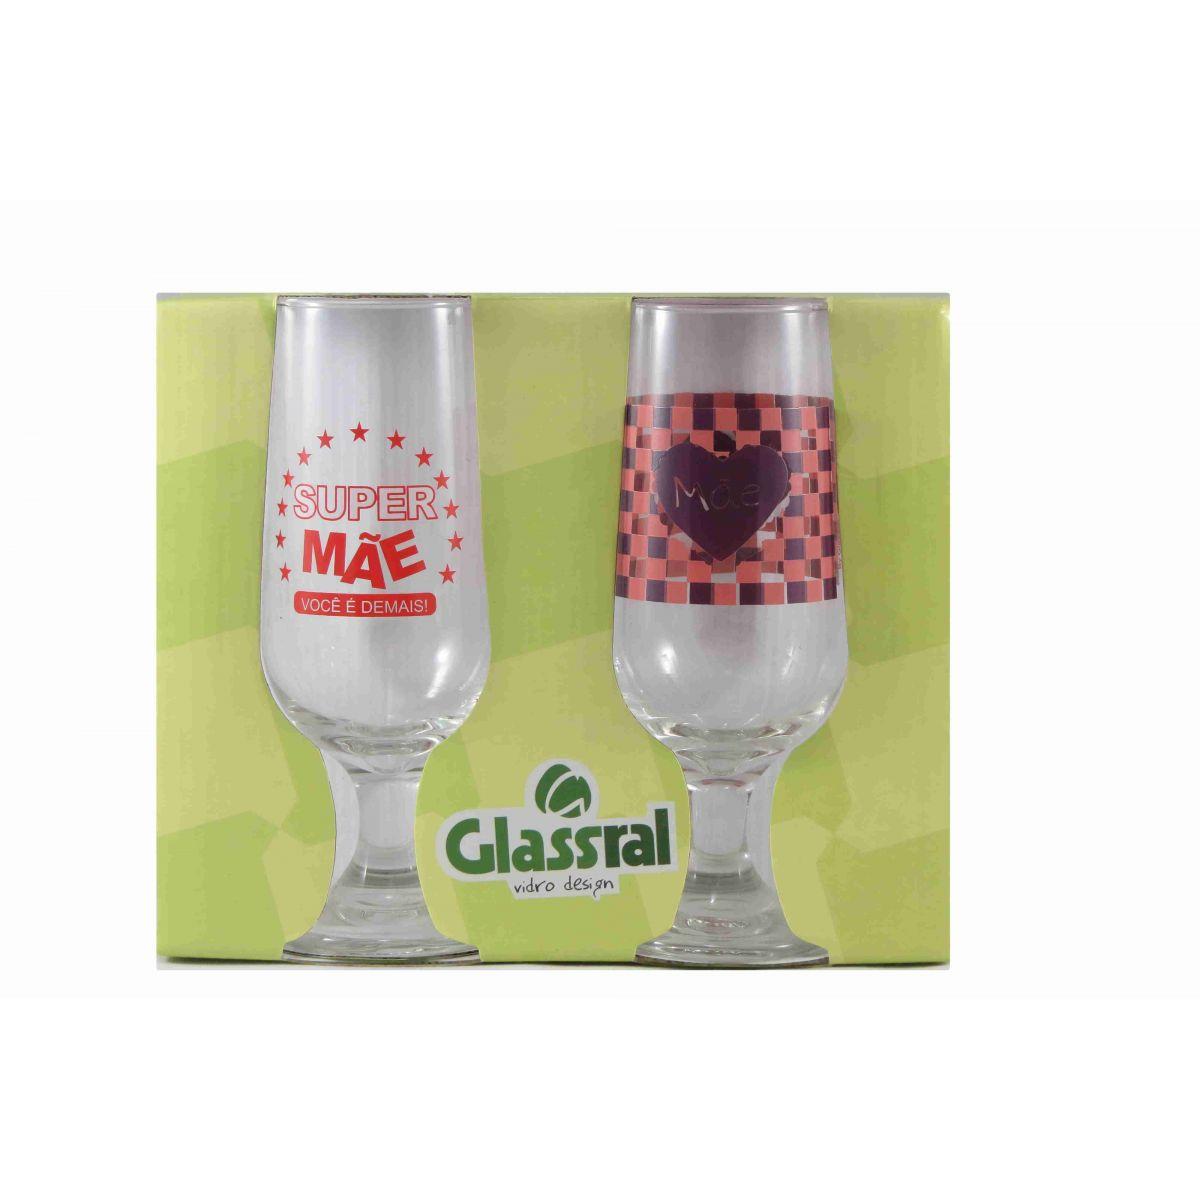 Jogo Taças 300ml Hannover Mãe 2 pcs Glassral